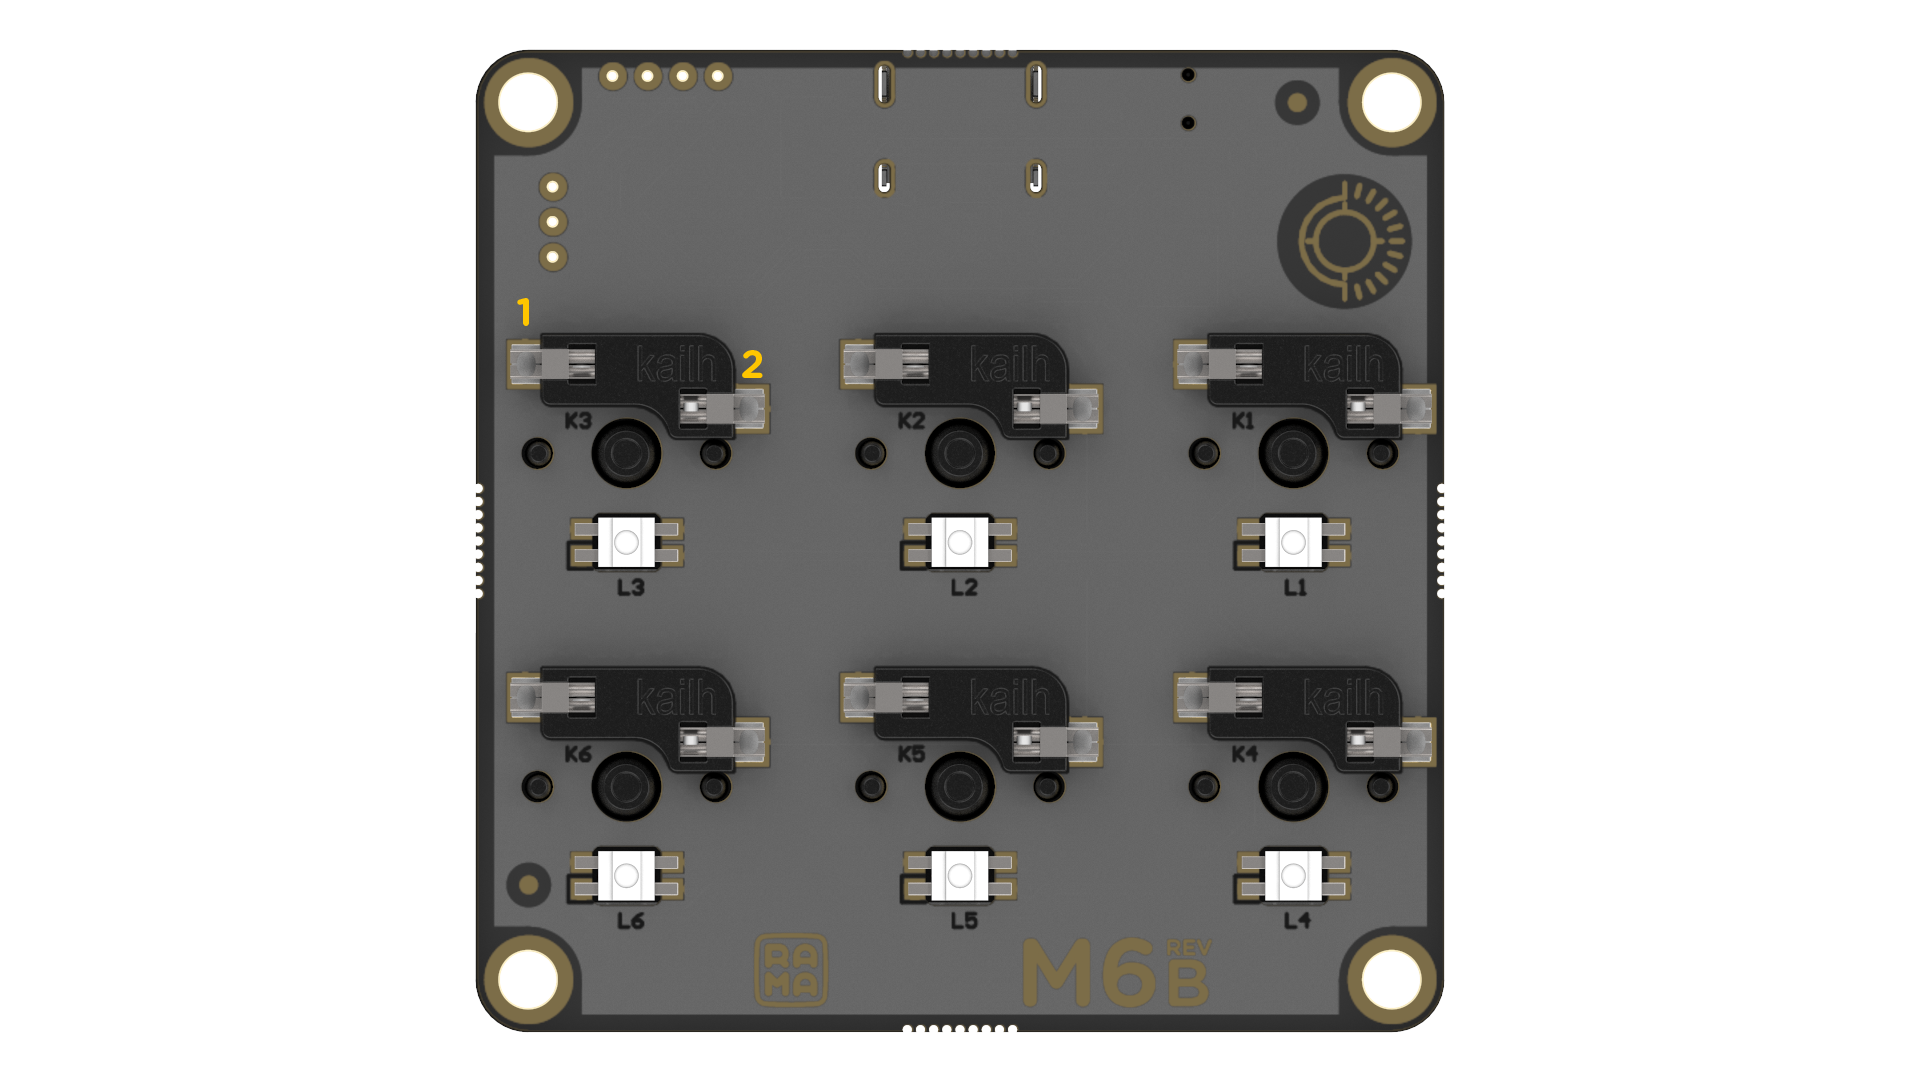 RW-M60-A-PCB-TROUBLESHOOT-01.1553-2.png